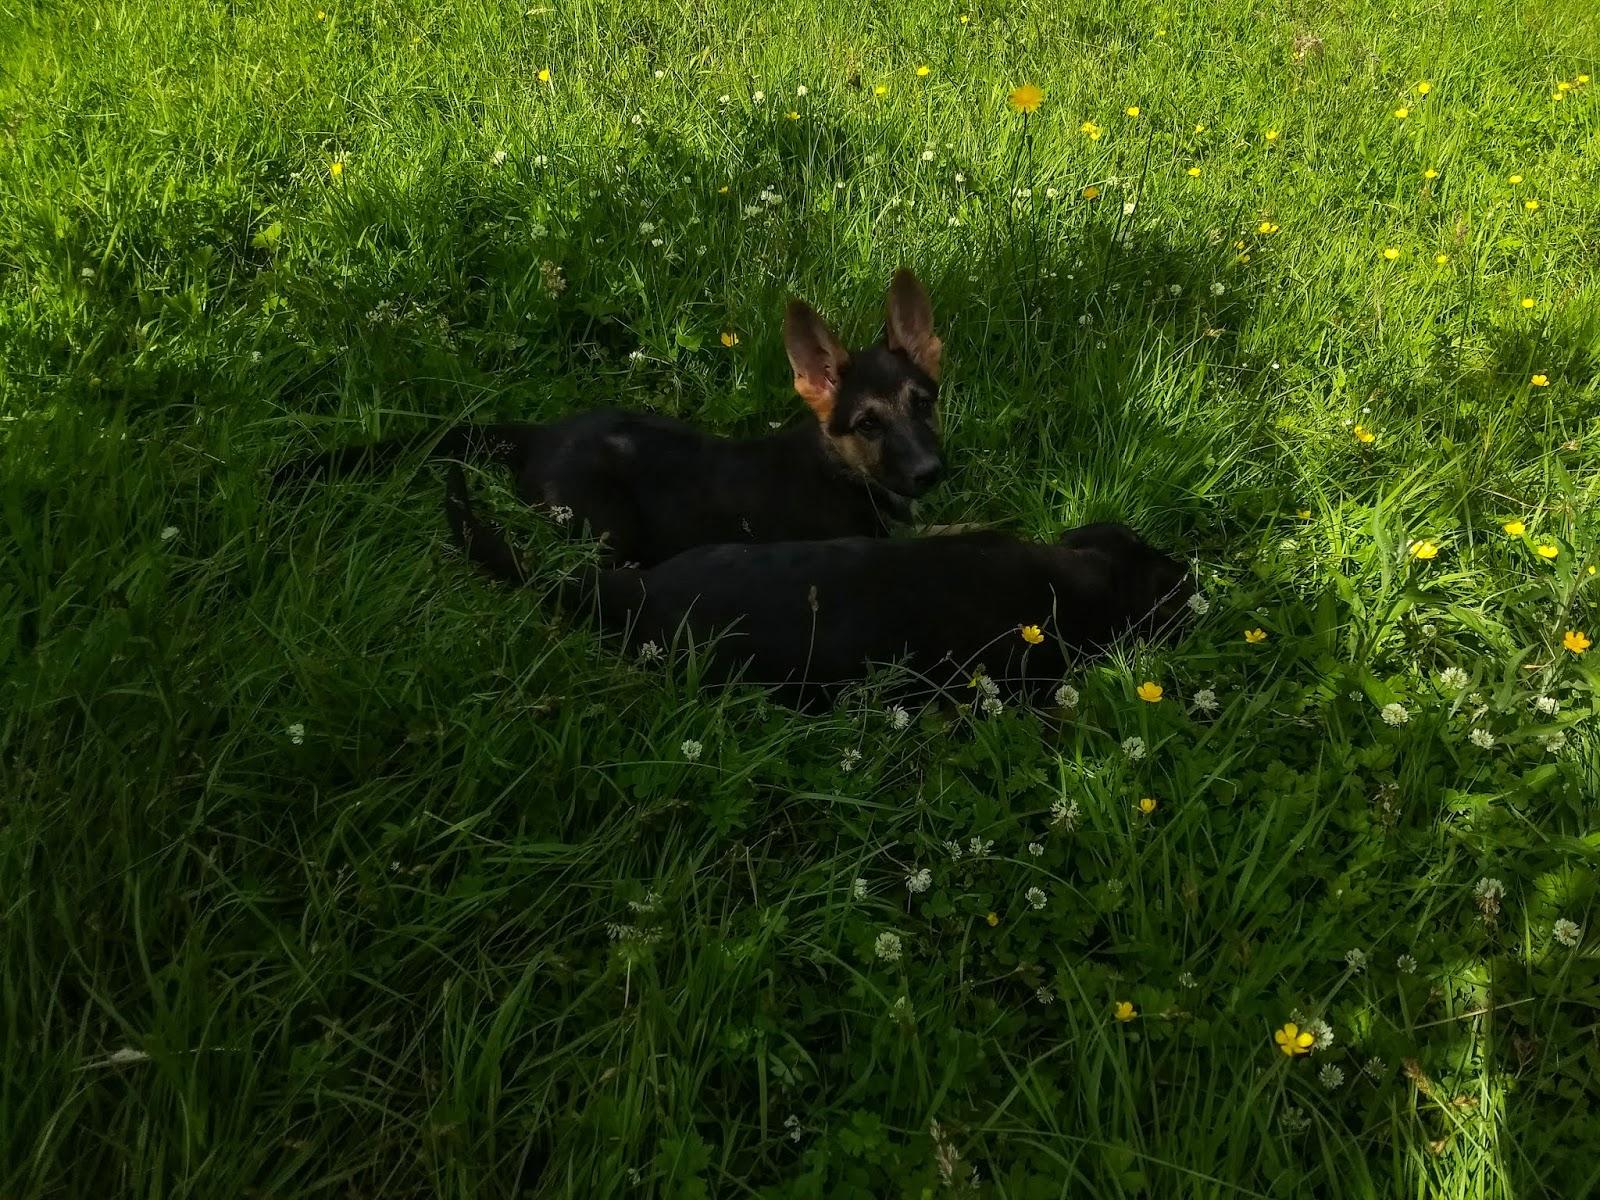 Two German Shepherd litter mates having an adventure in the grass.